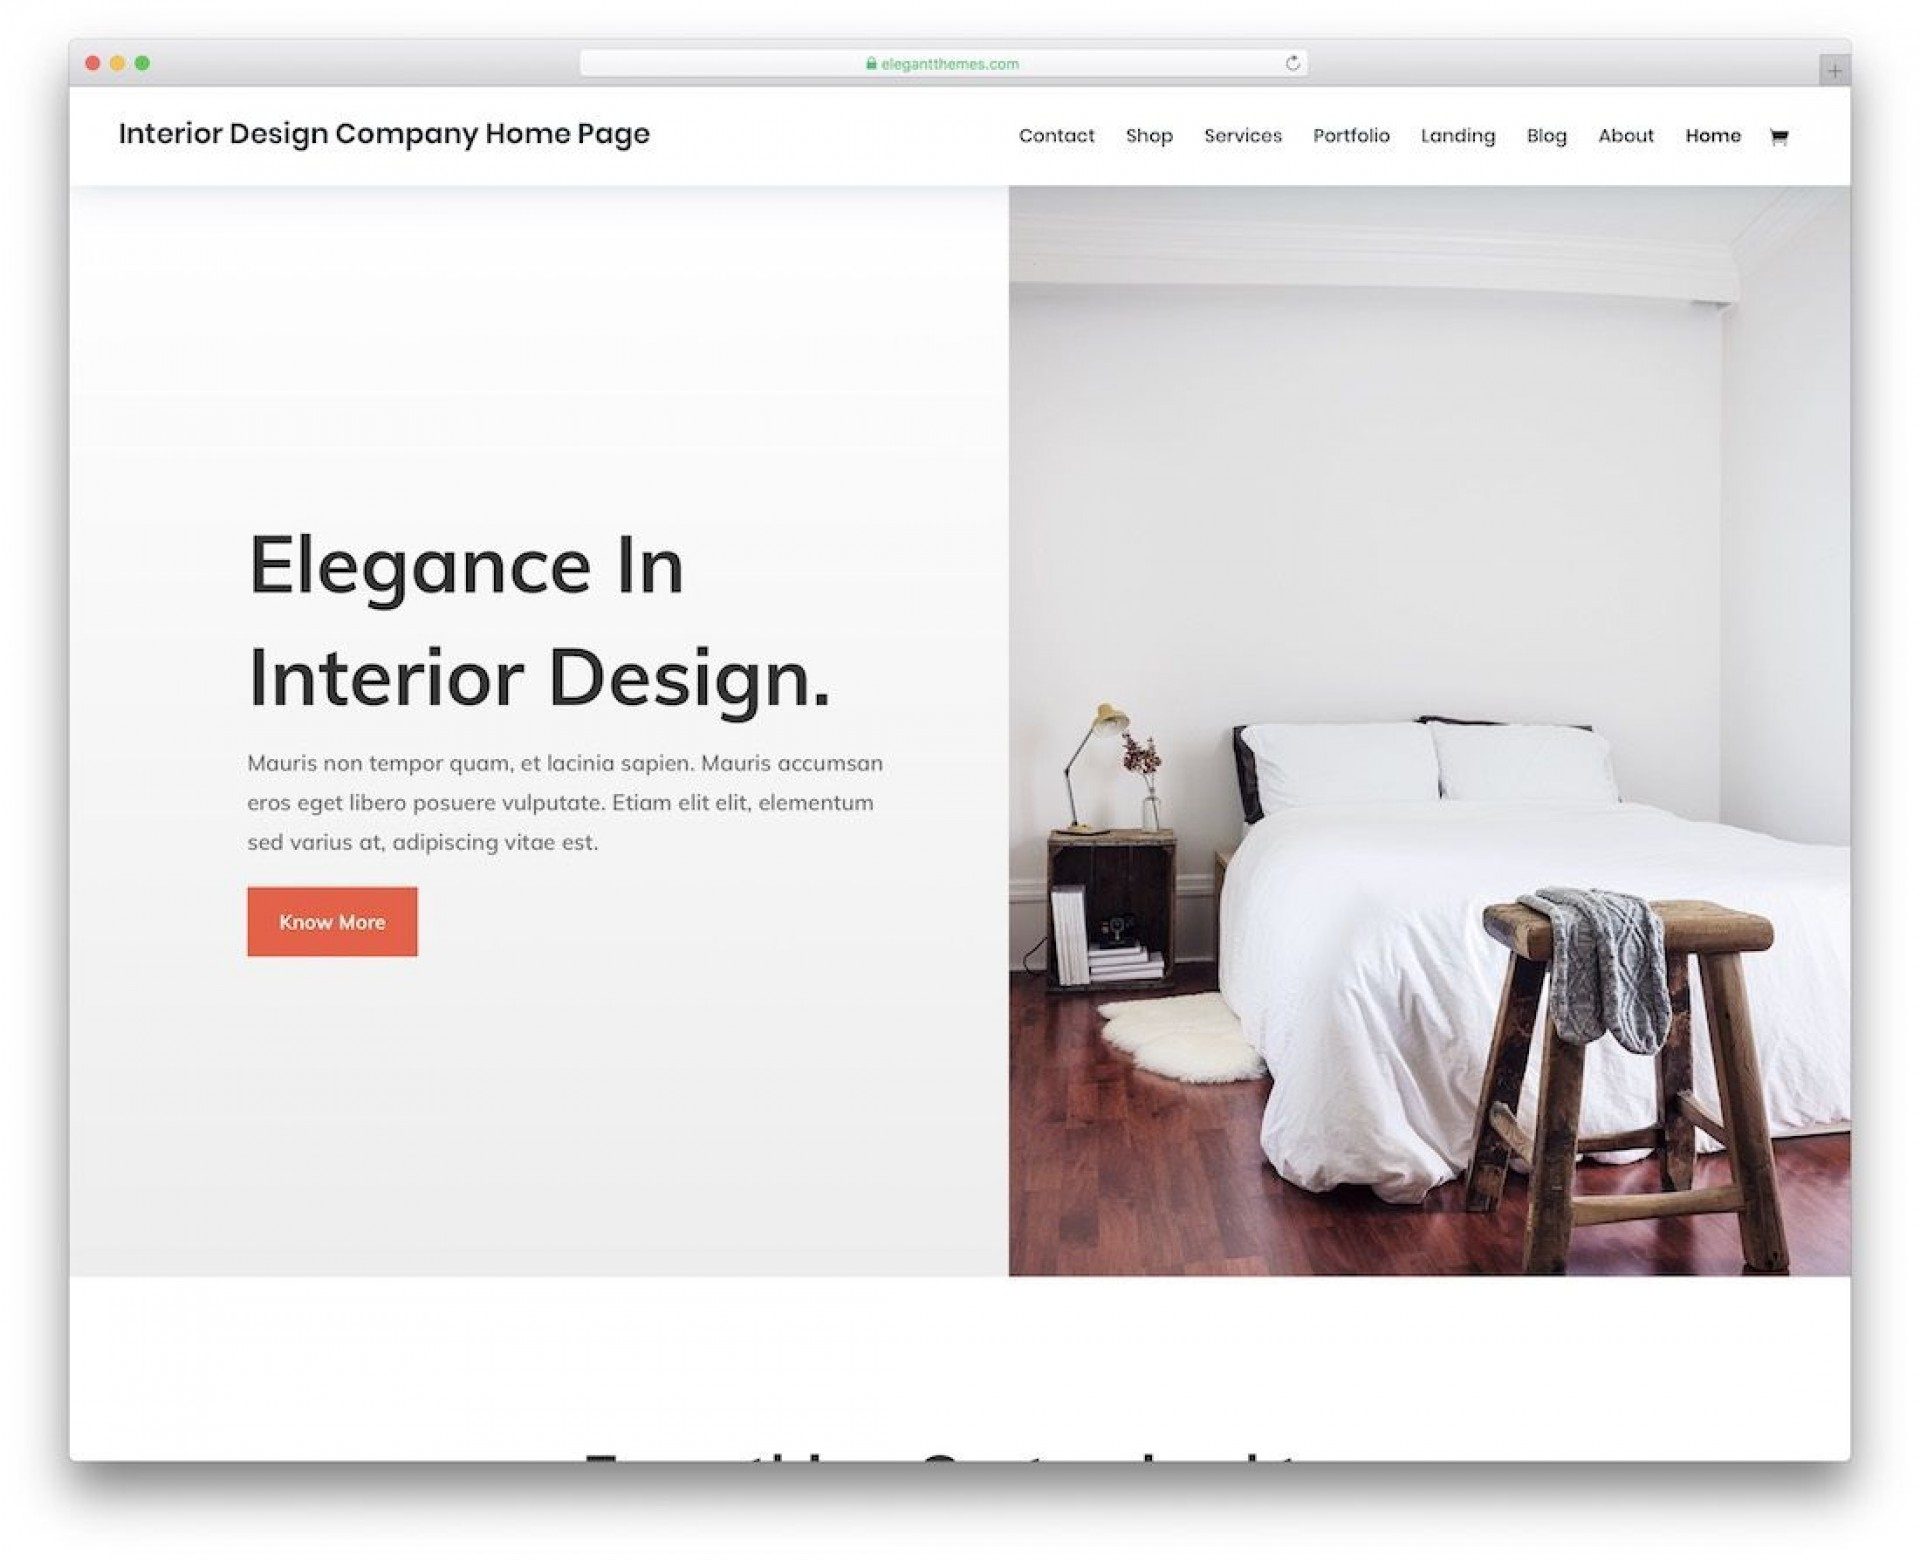 001 Phenomenal Interior Design Html Template Free Inspiration  Download1920